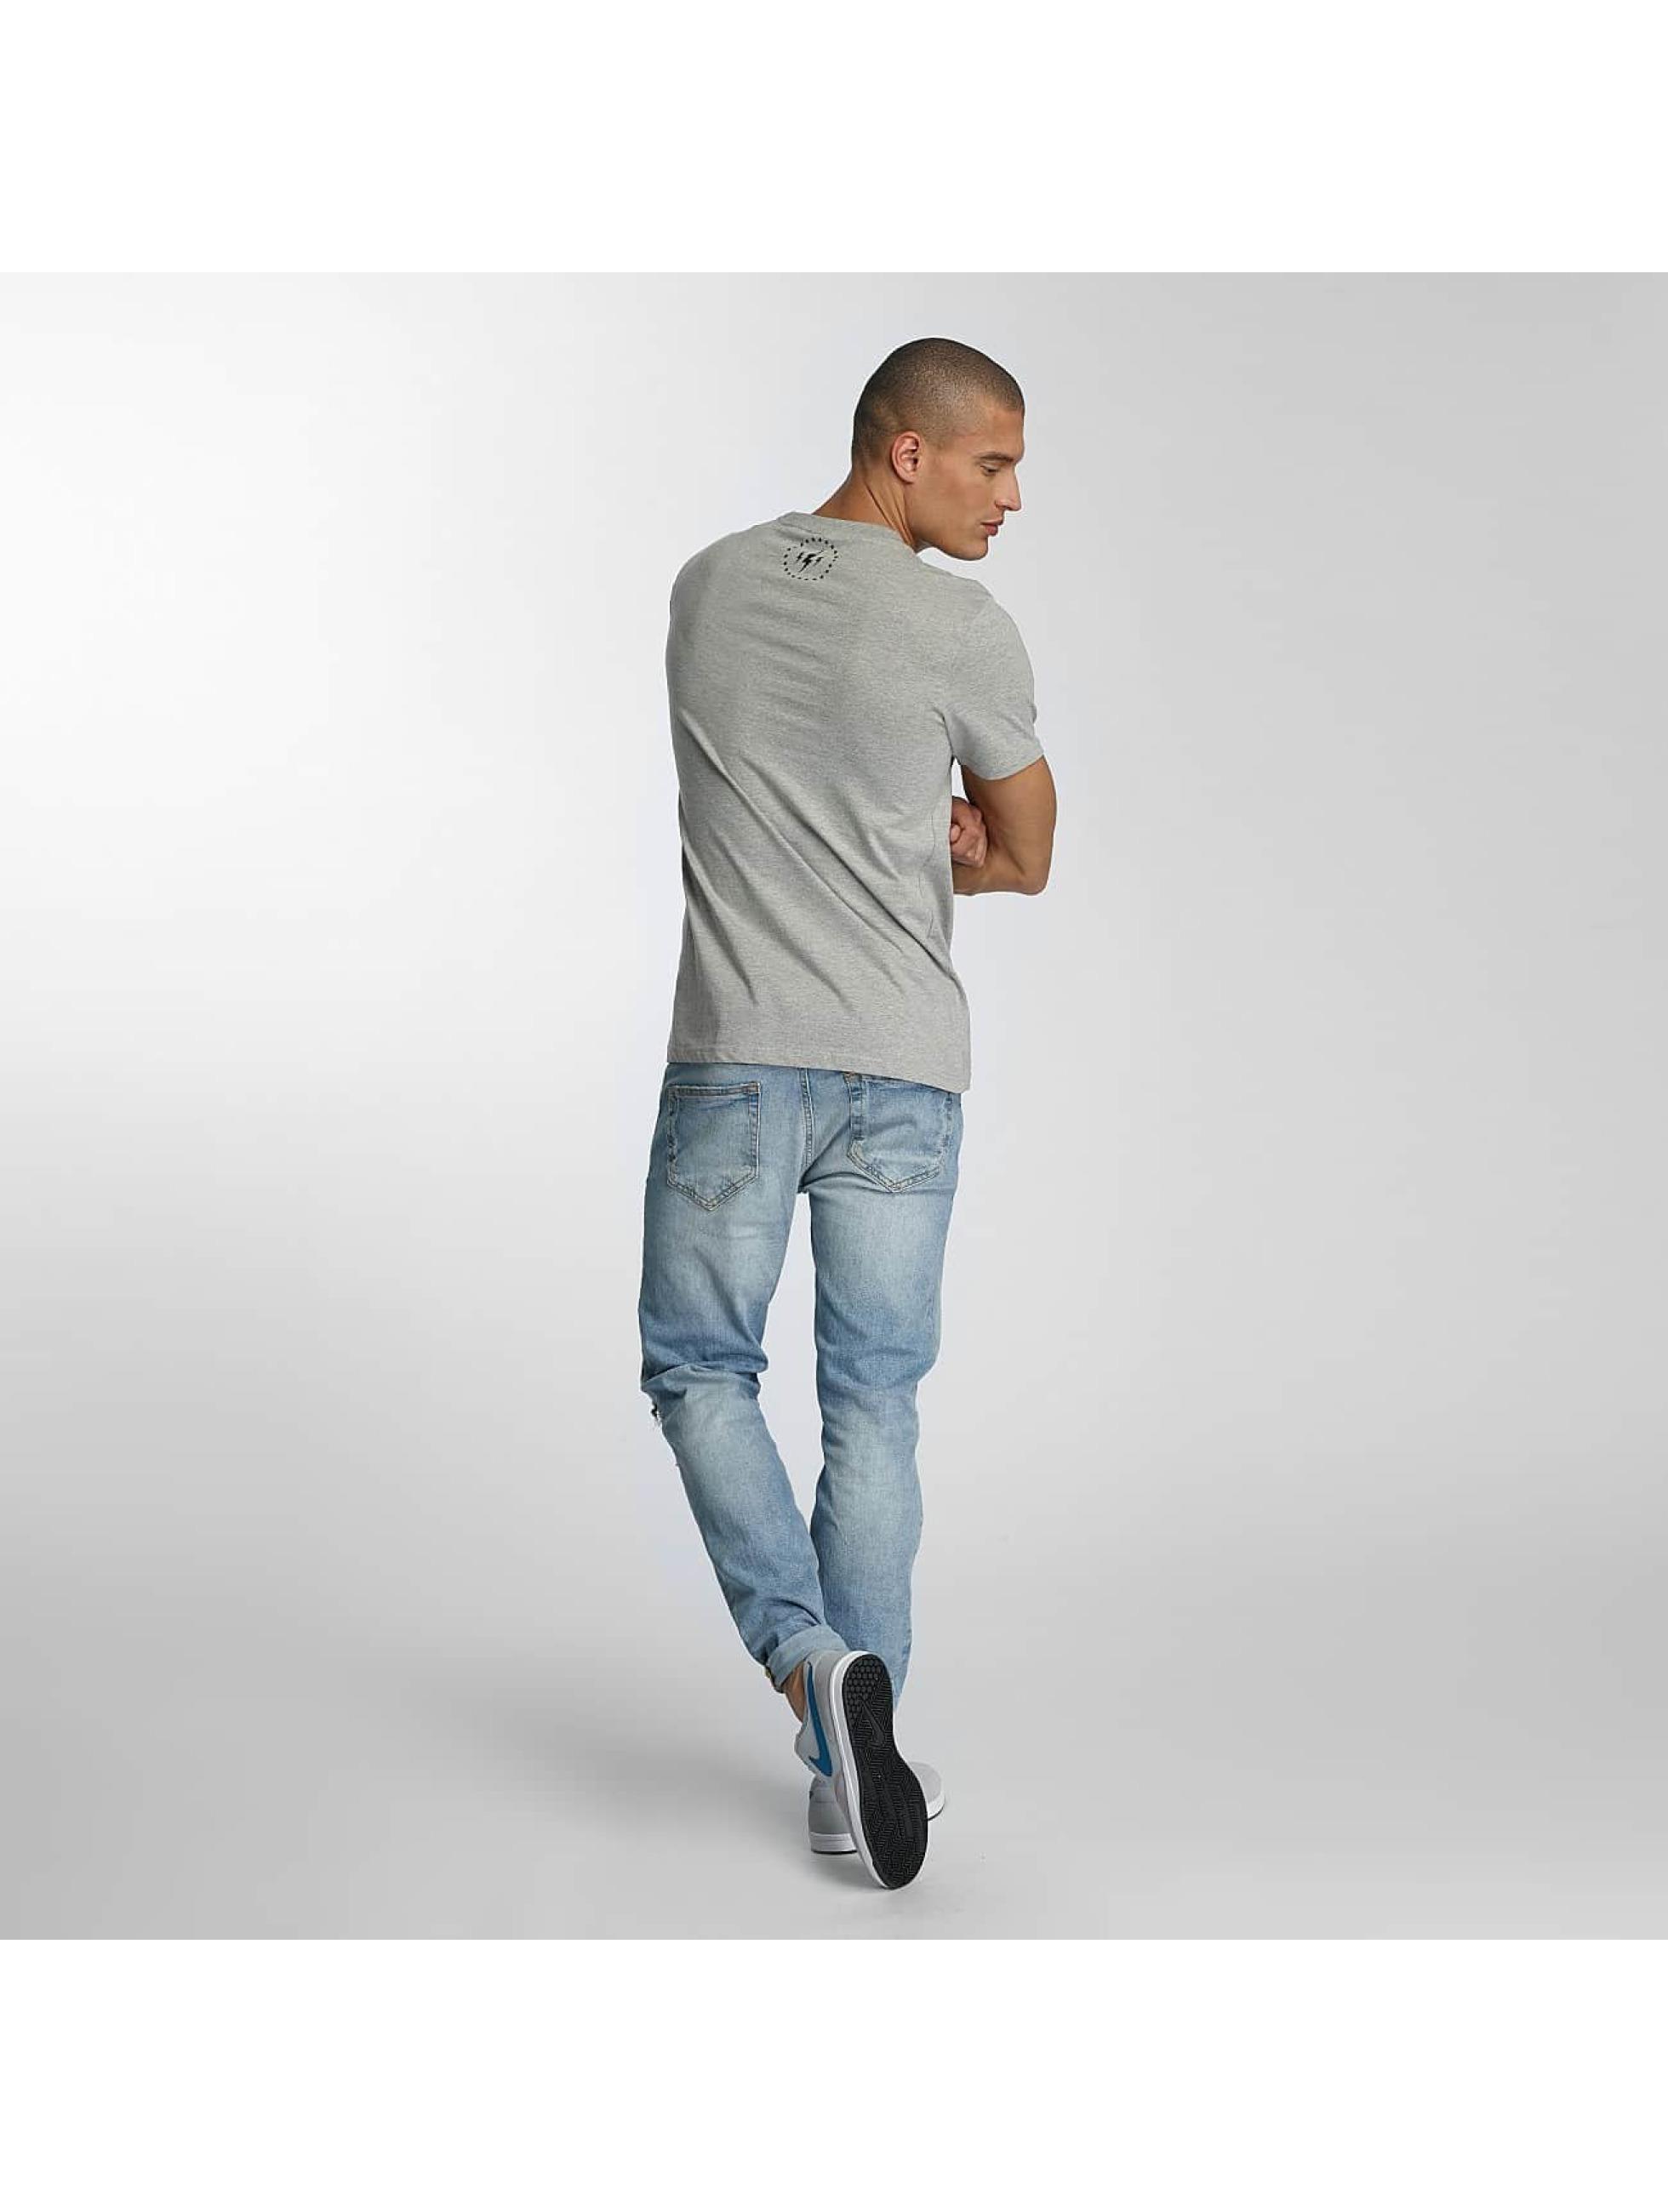 TrueSpin T-paidat 7 harmaa